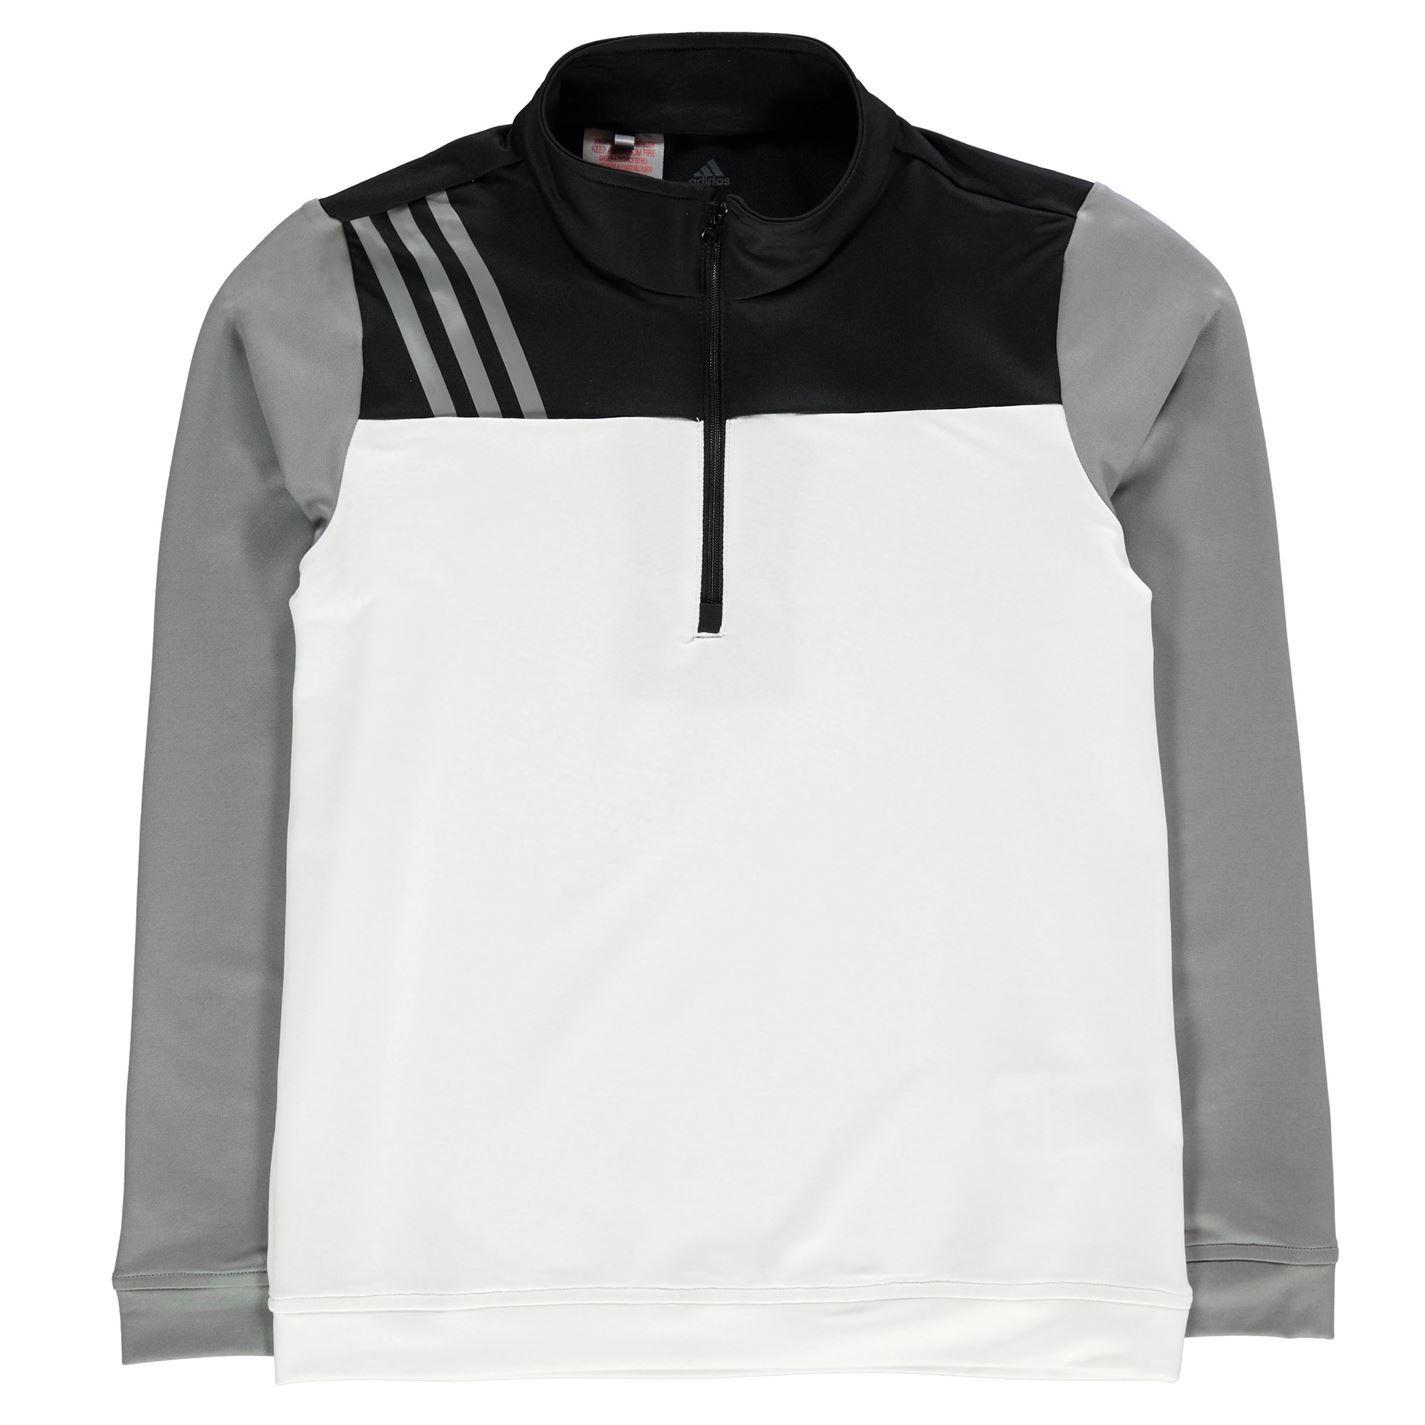 adidas Kids Boys 3 Stripe Half Zip Top Junior Pullover Sweater ... 2c2ef2725eca